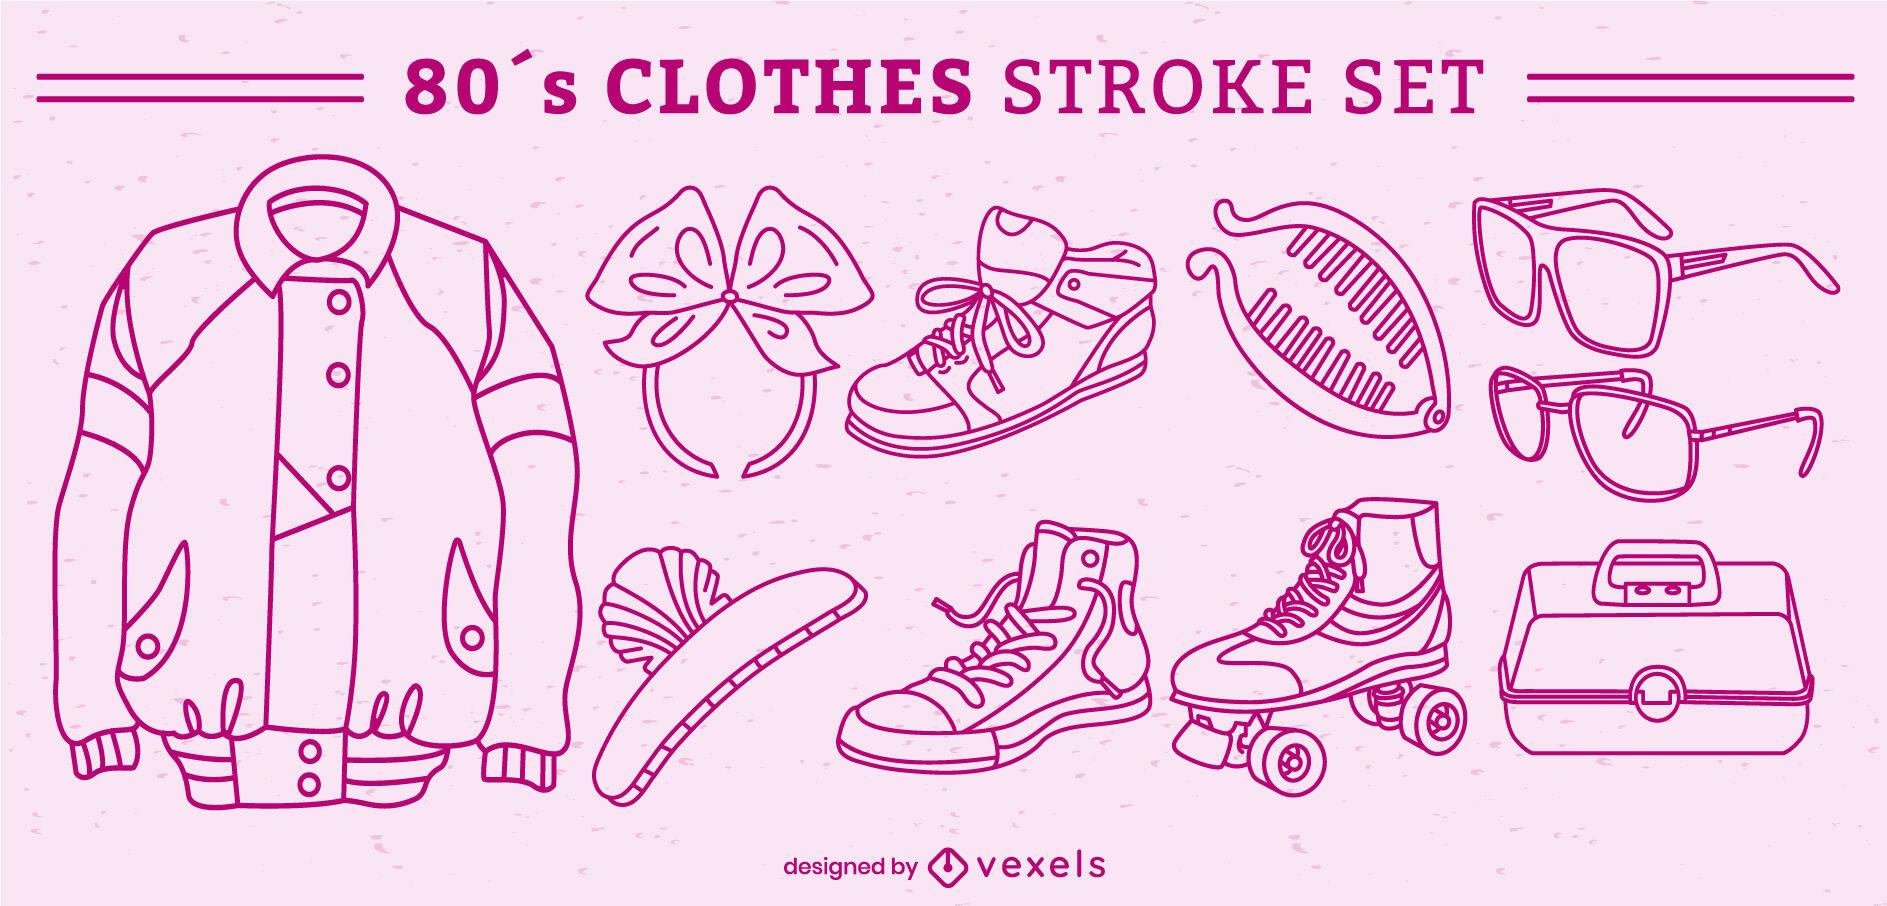 Retro-Kleidungselemente-Stroke-Set